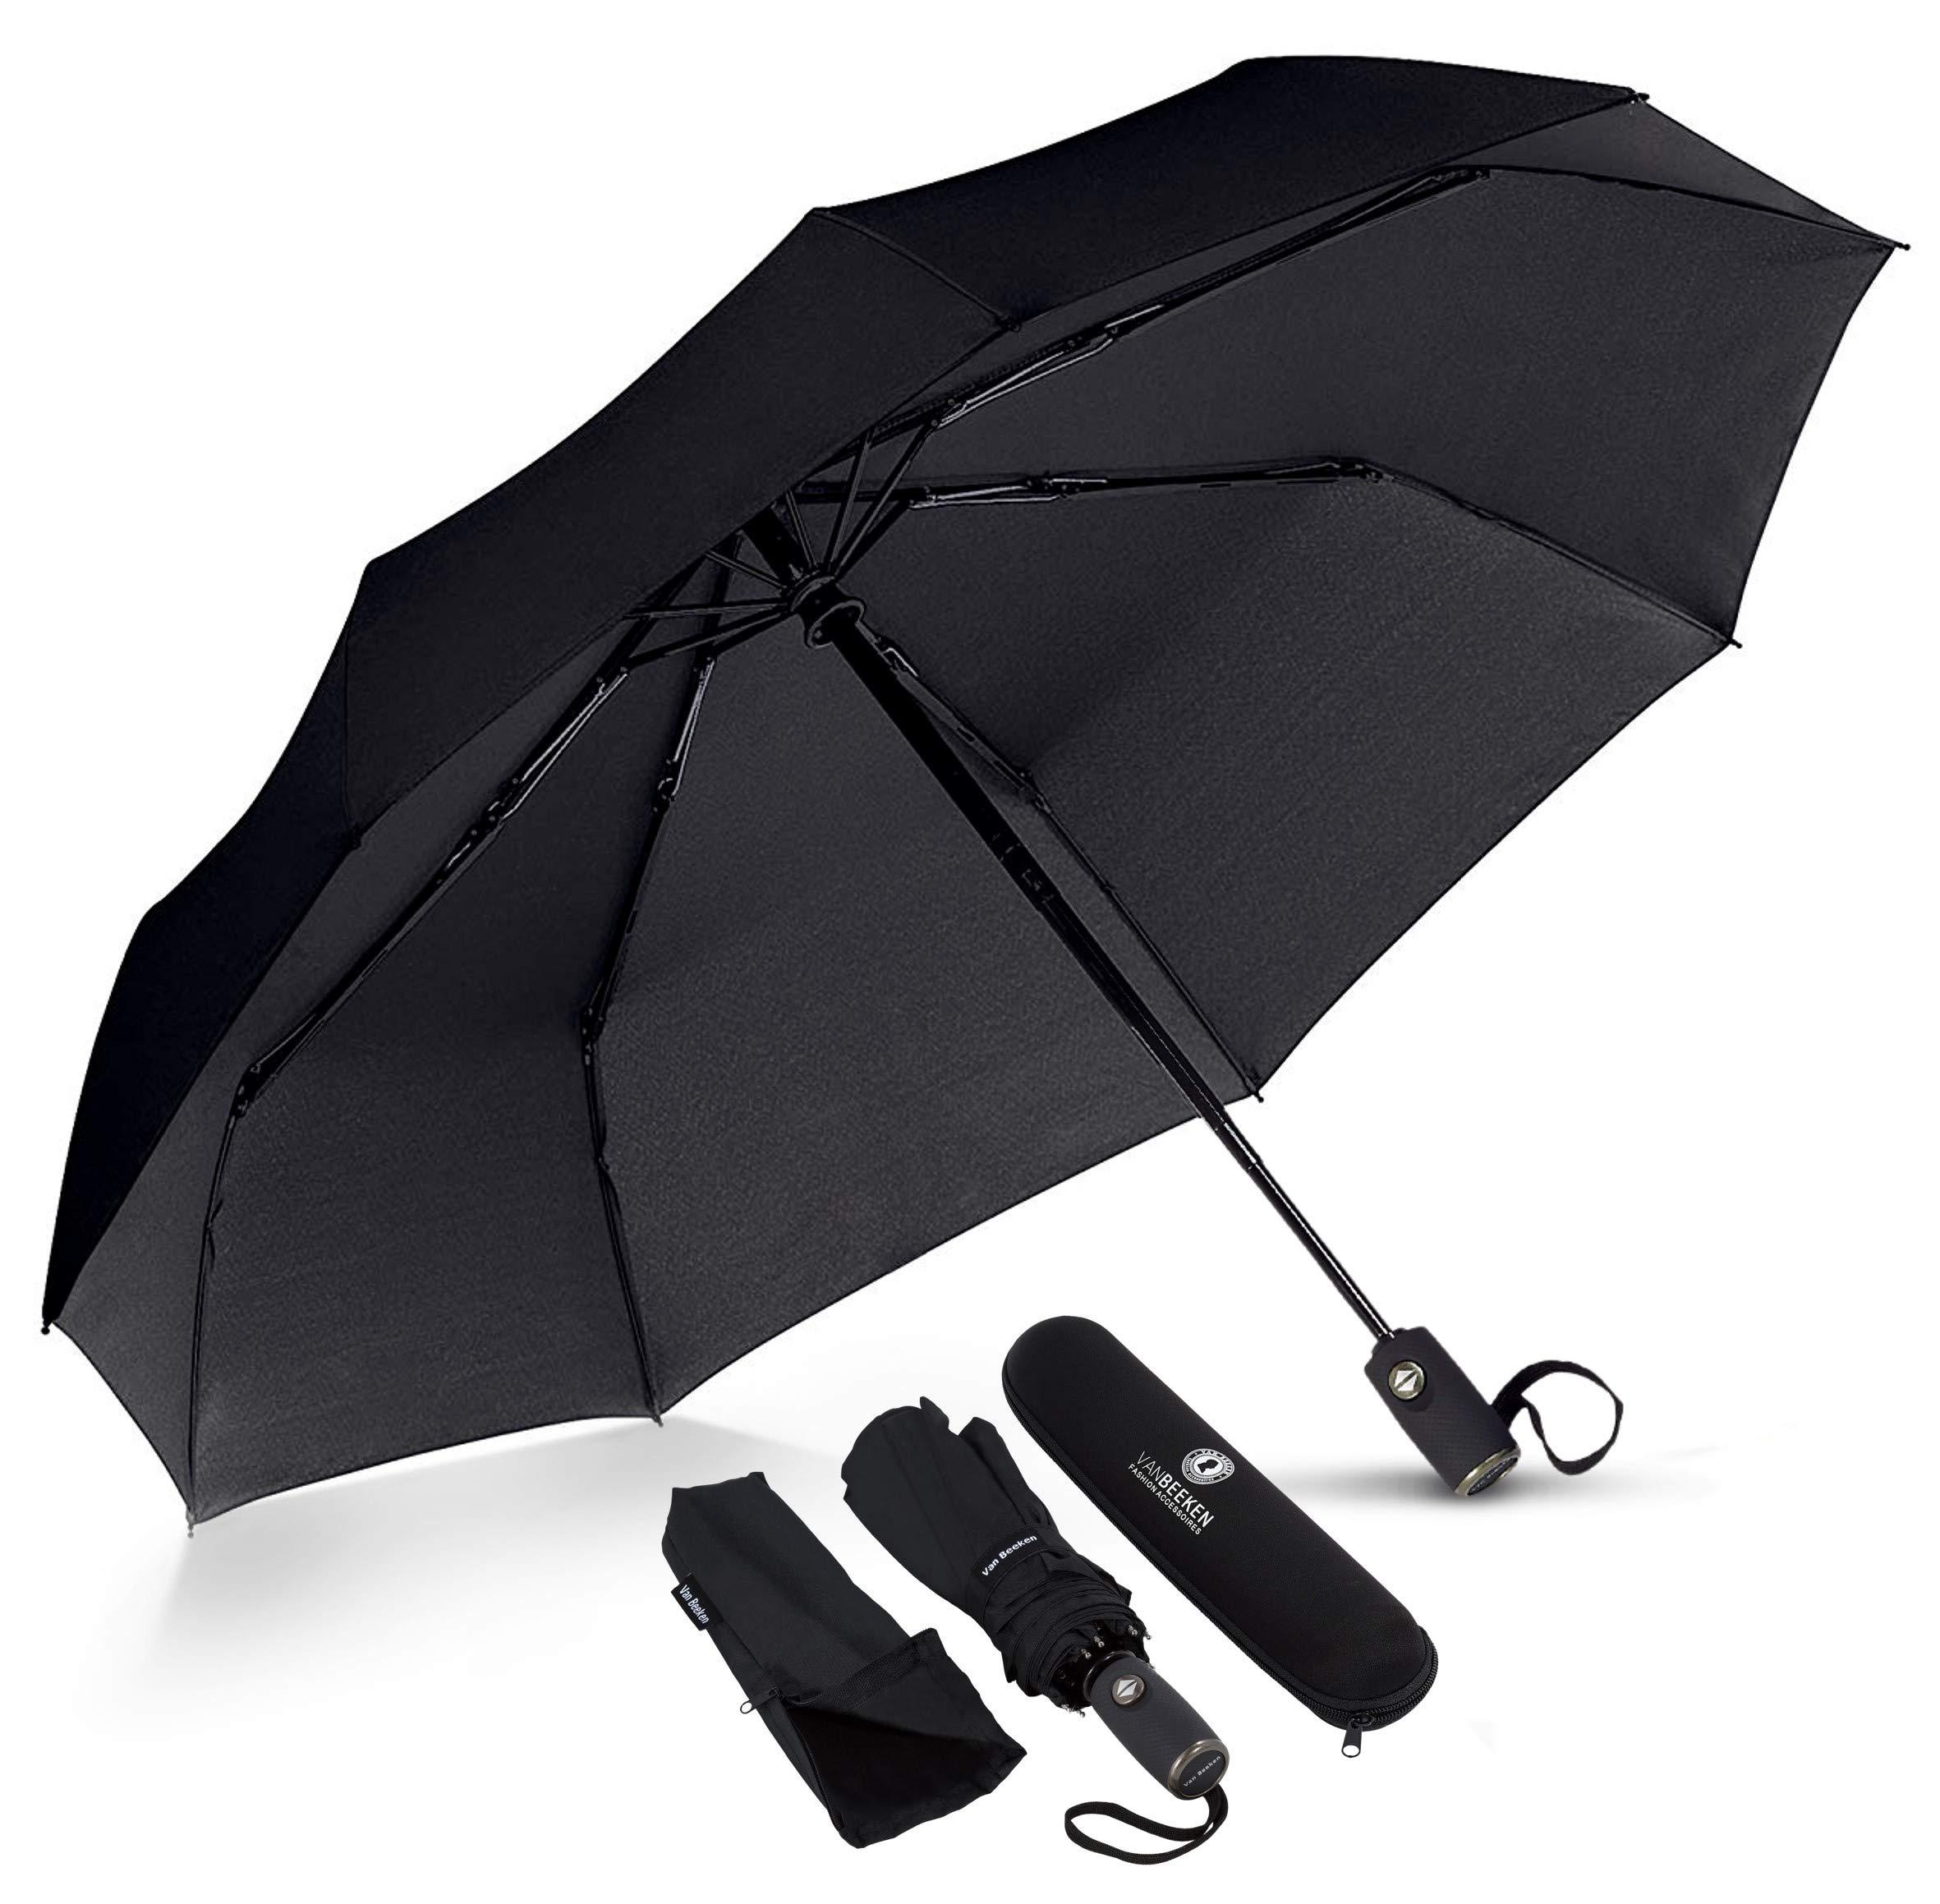 VAN BEEKEN Umbrella Windproof I Wind Resistant Travel Umbrella with Teflon I Light Compact Umbrella I Mini Umbrella Portable Folding Umbrella for Men Women (Black)